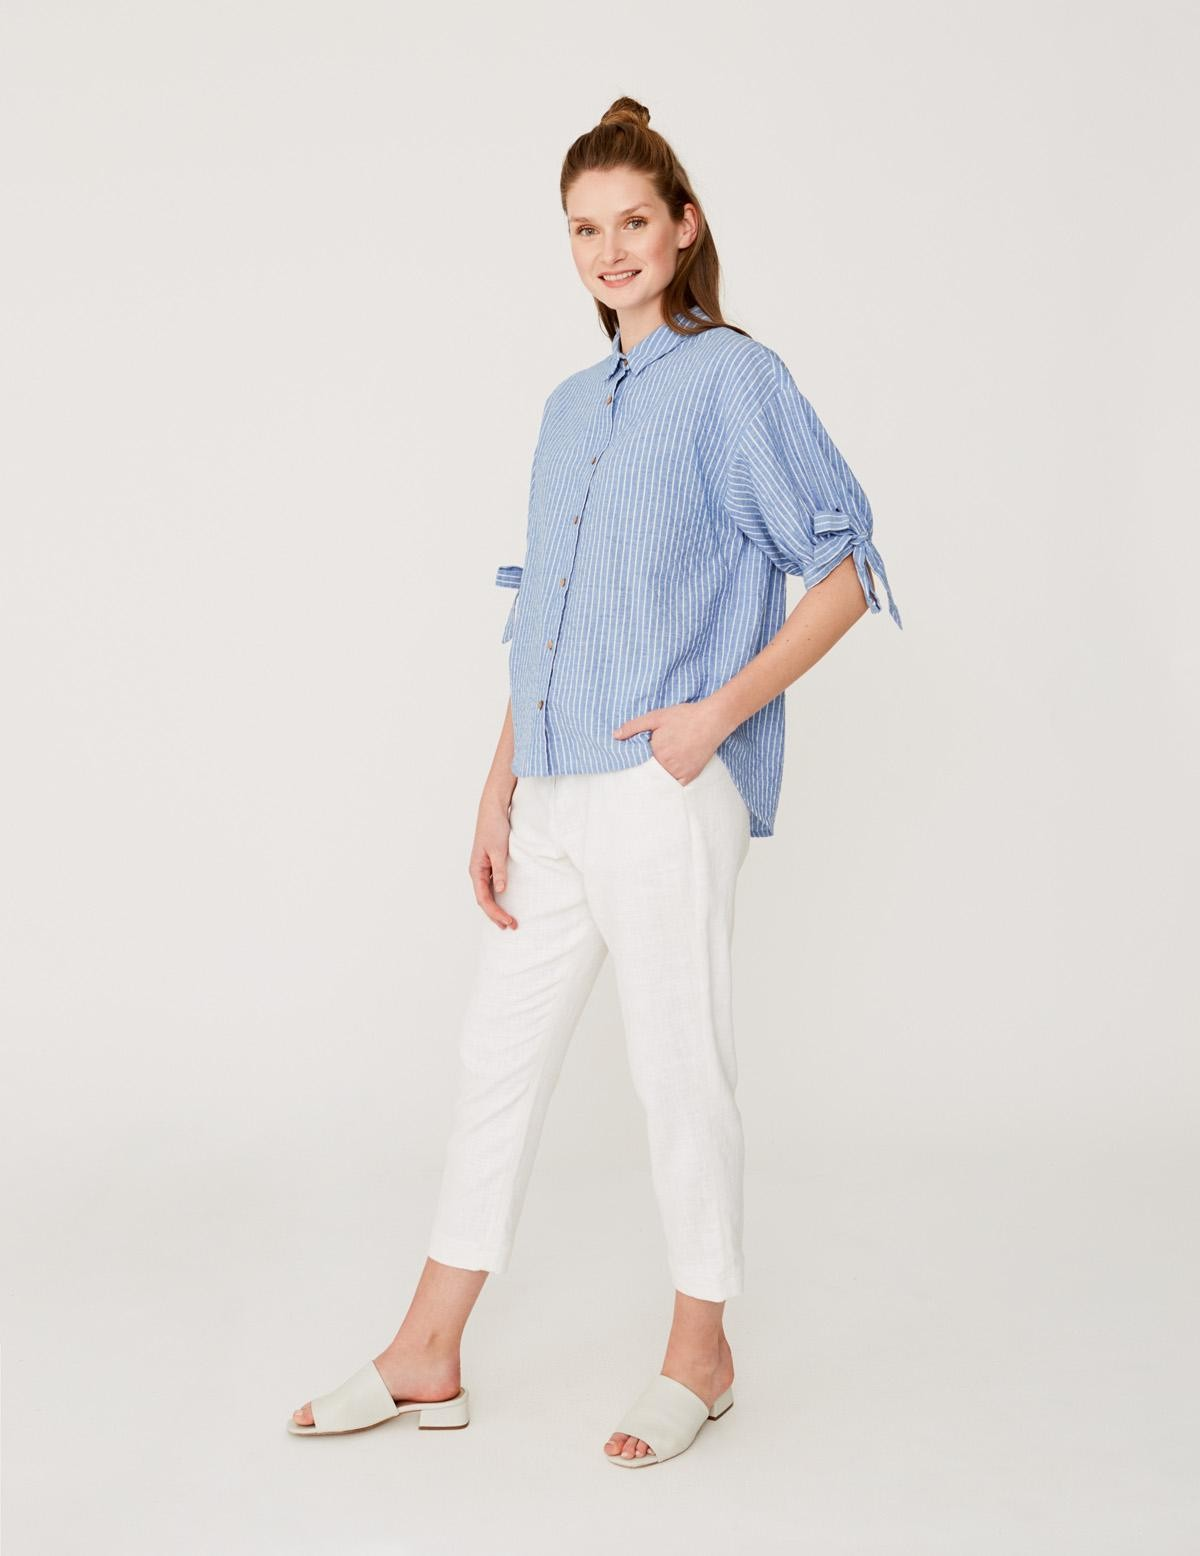 Puffed sleeved shirt - Item1